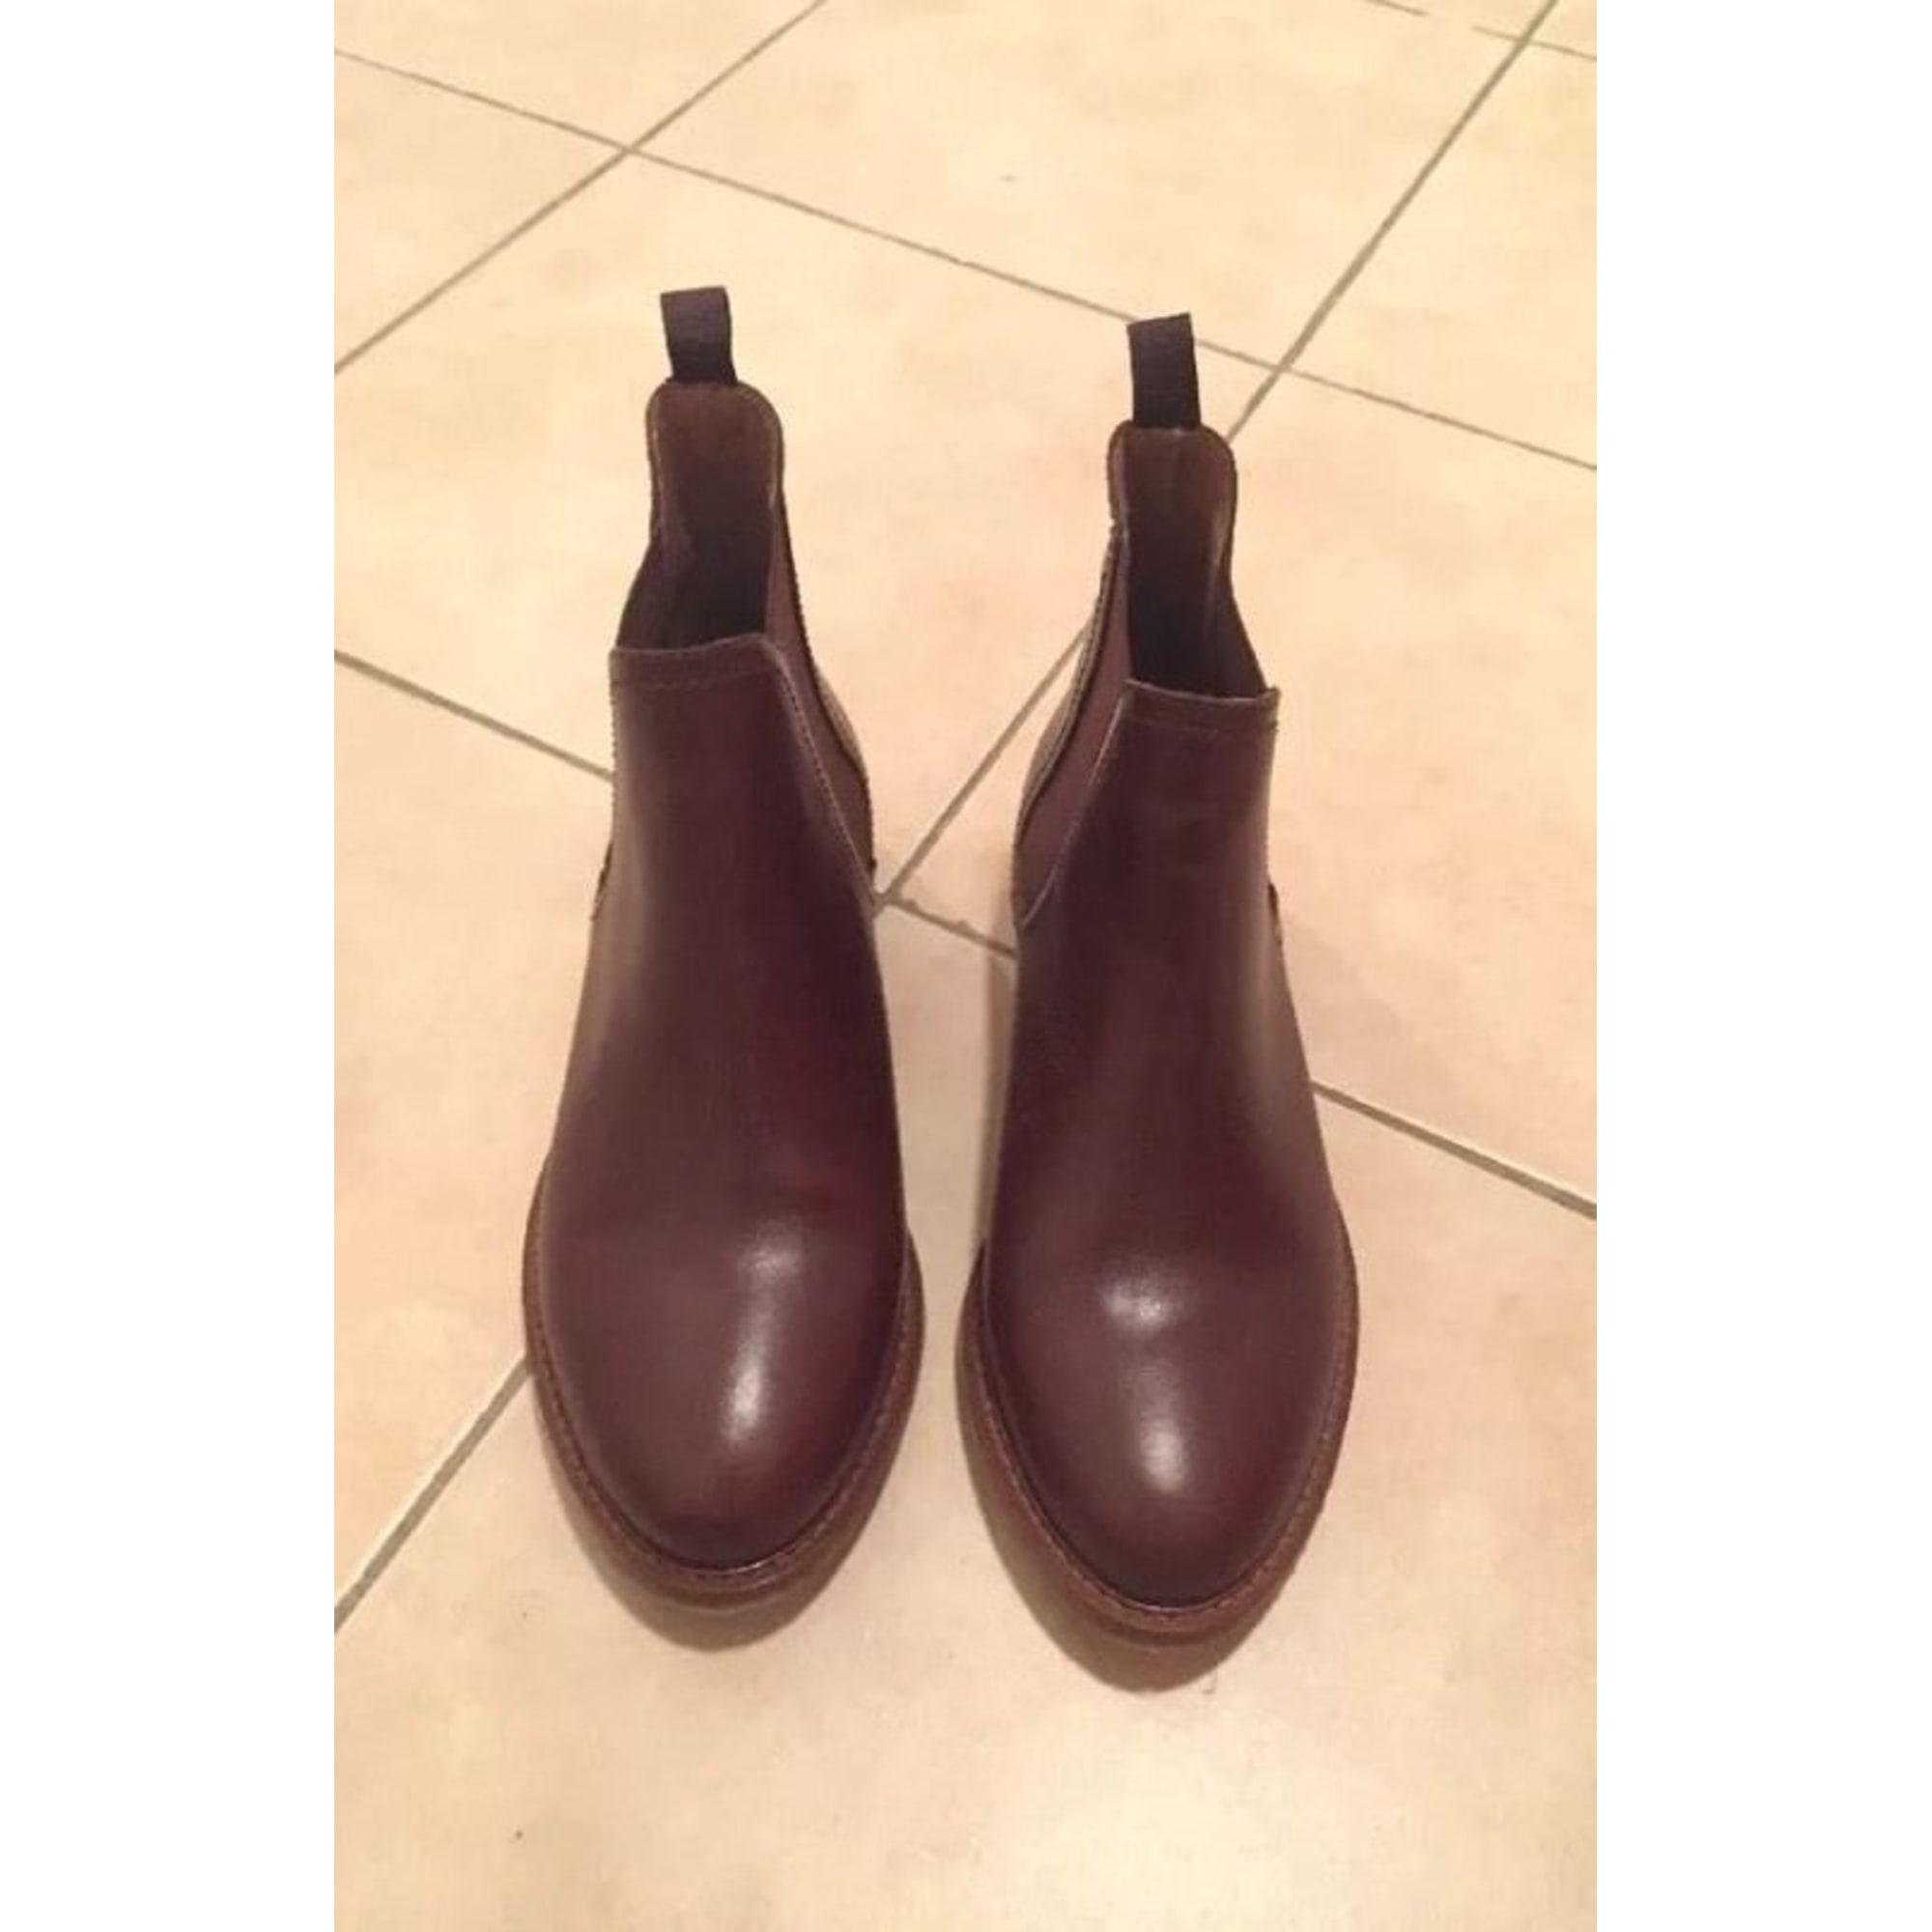 Bottines & low boots plates JONAK 37 marron vendu par